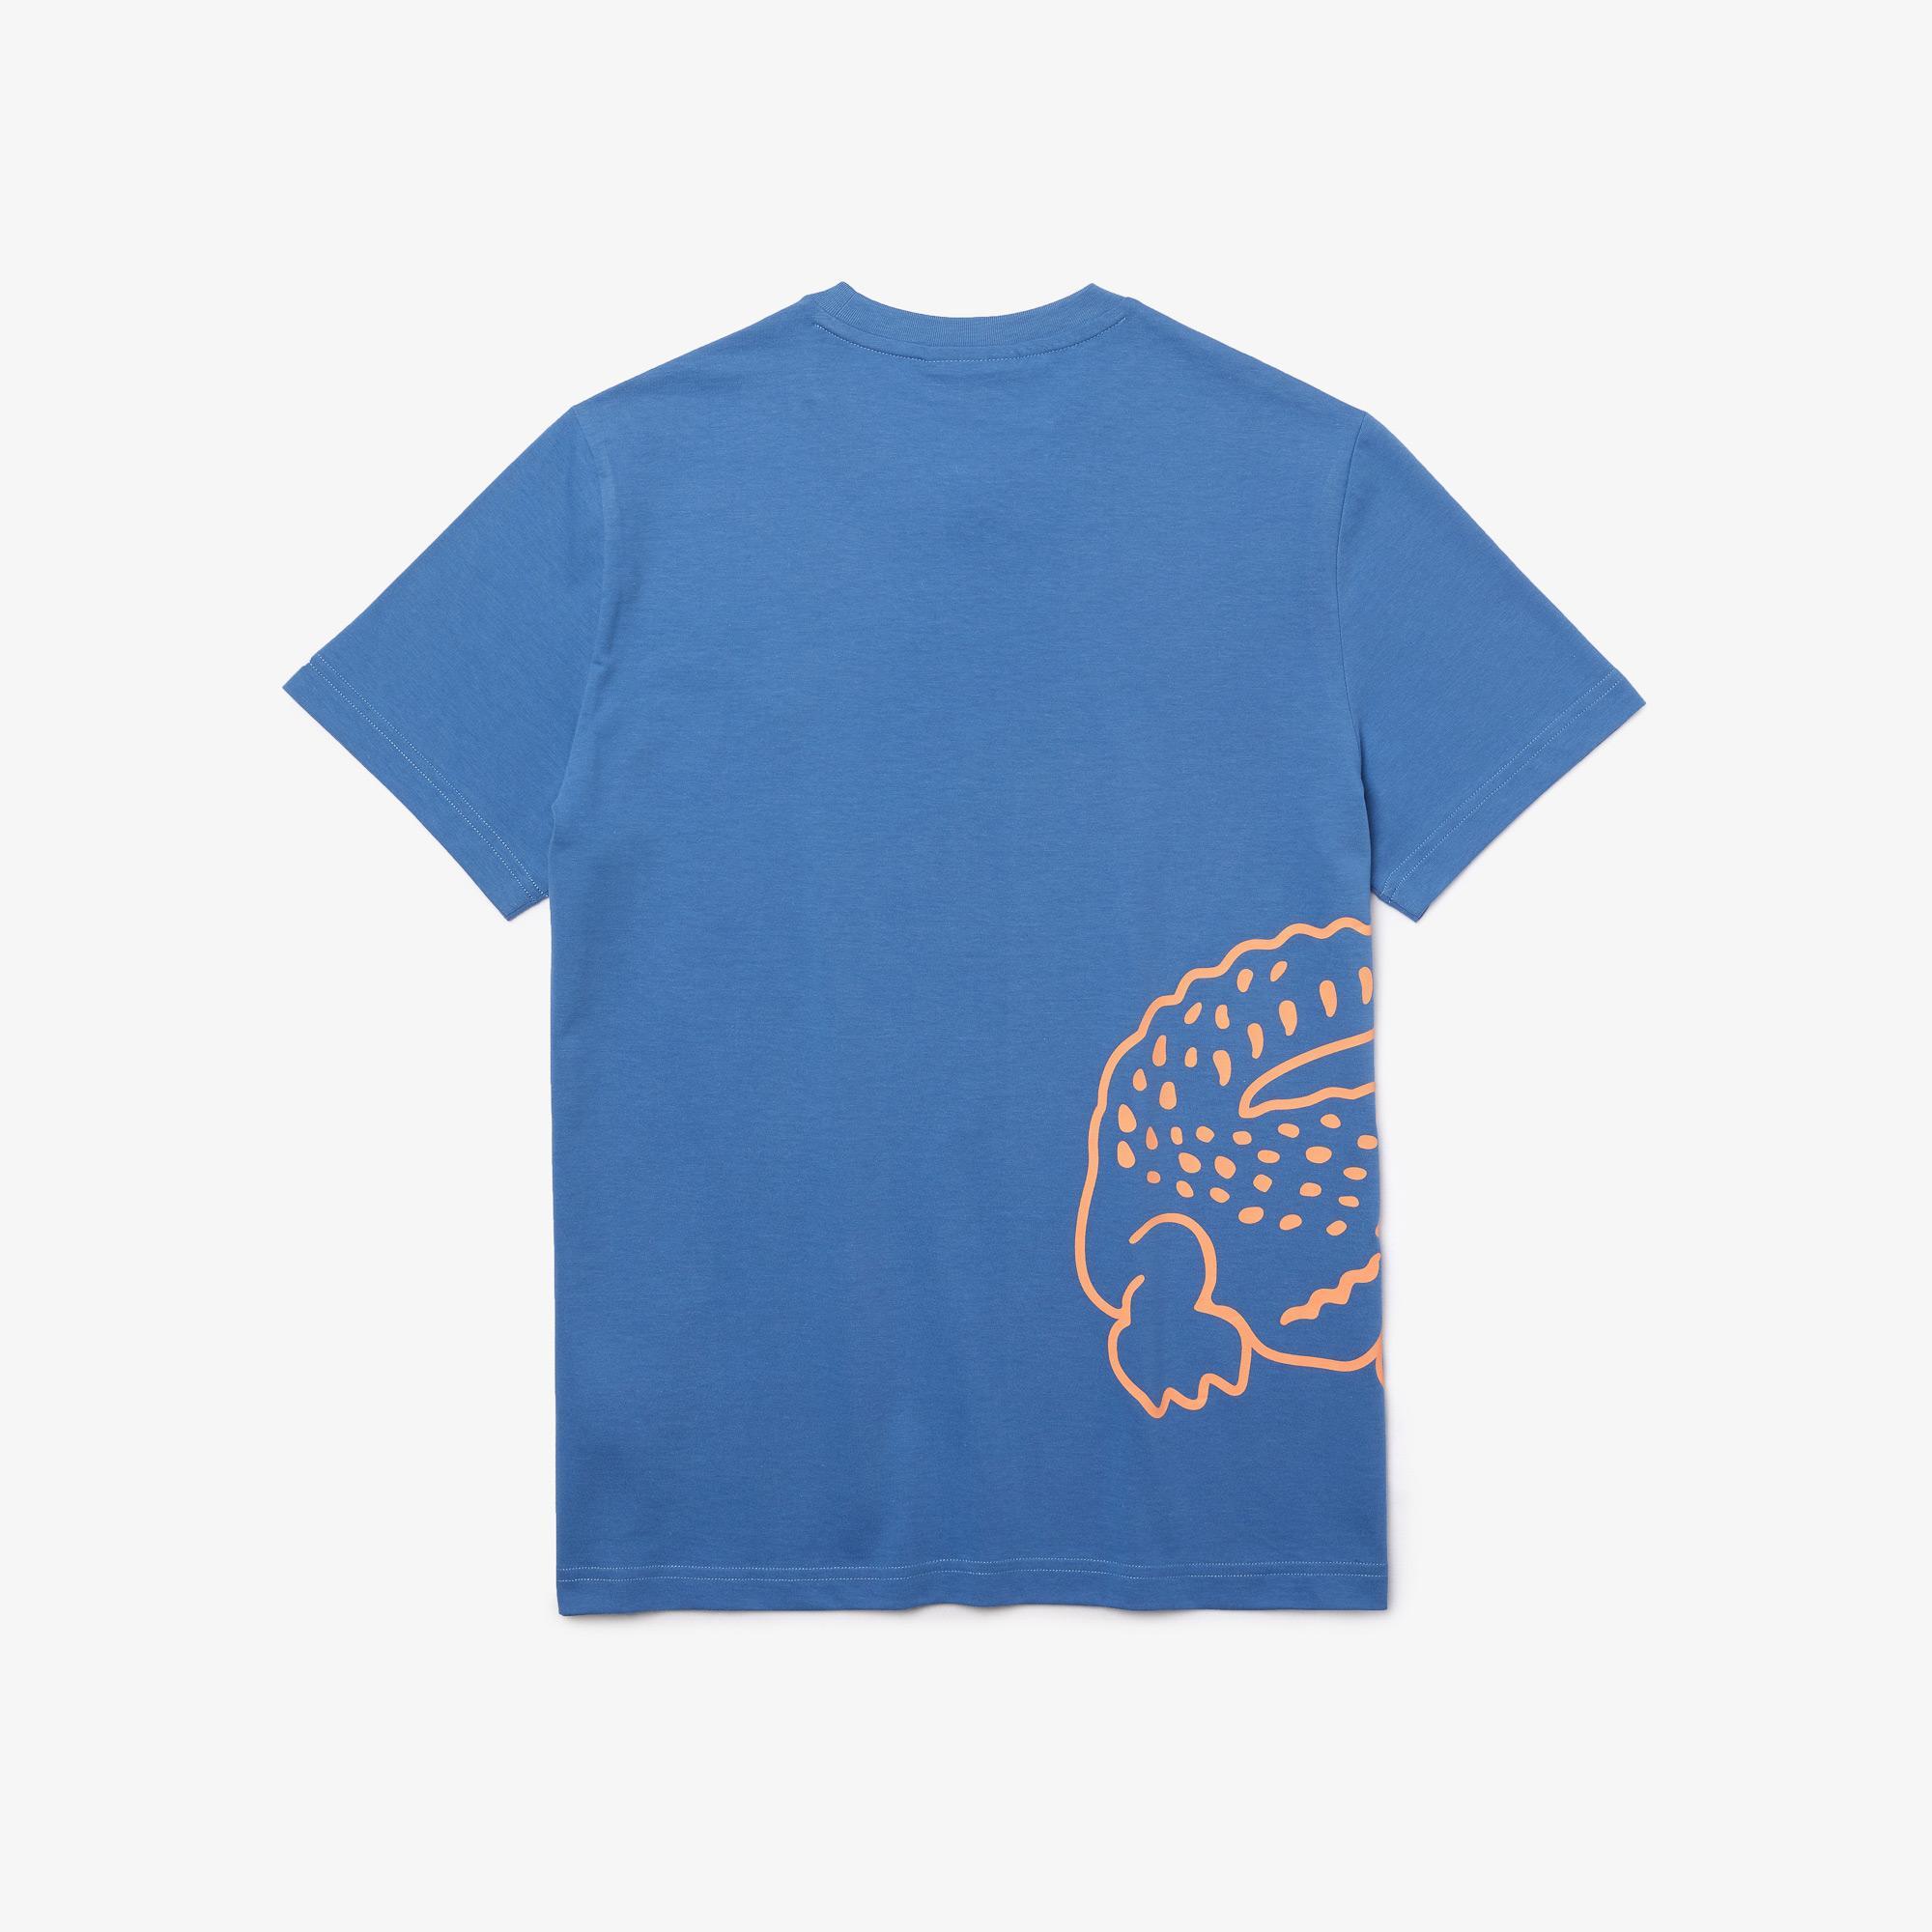 Lacoste Erkek Regular Fit Bisiklet Yaka Baskılı Mavi T-Shirt